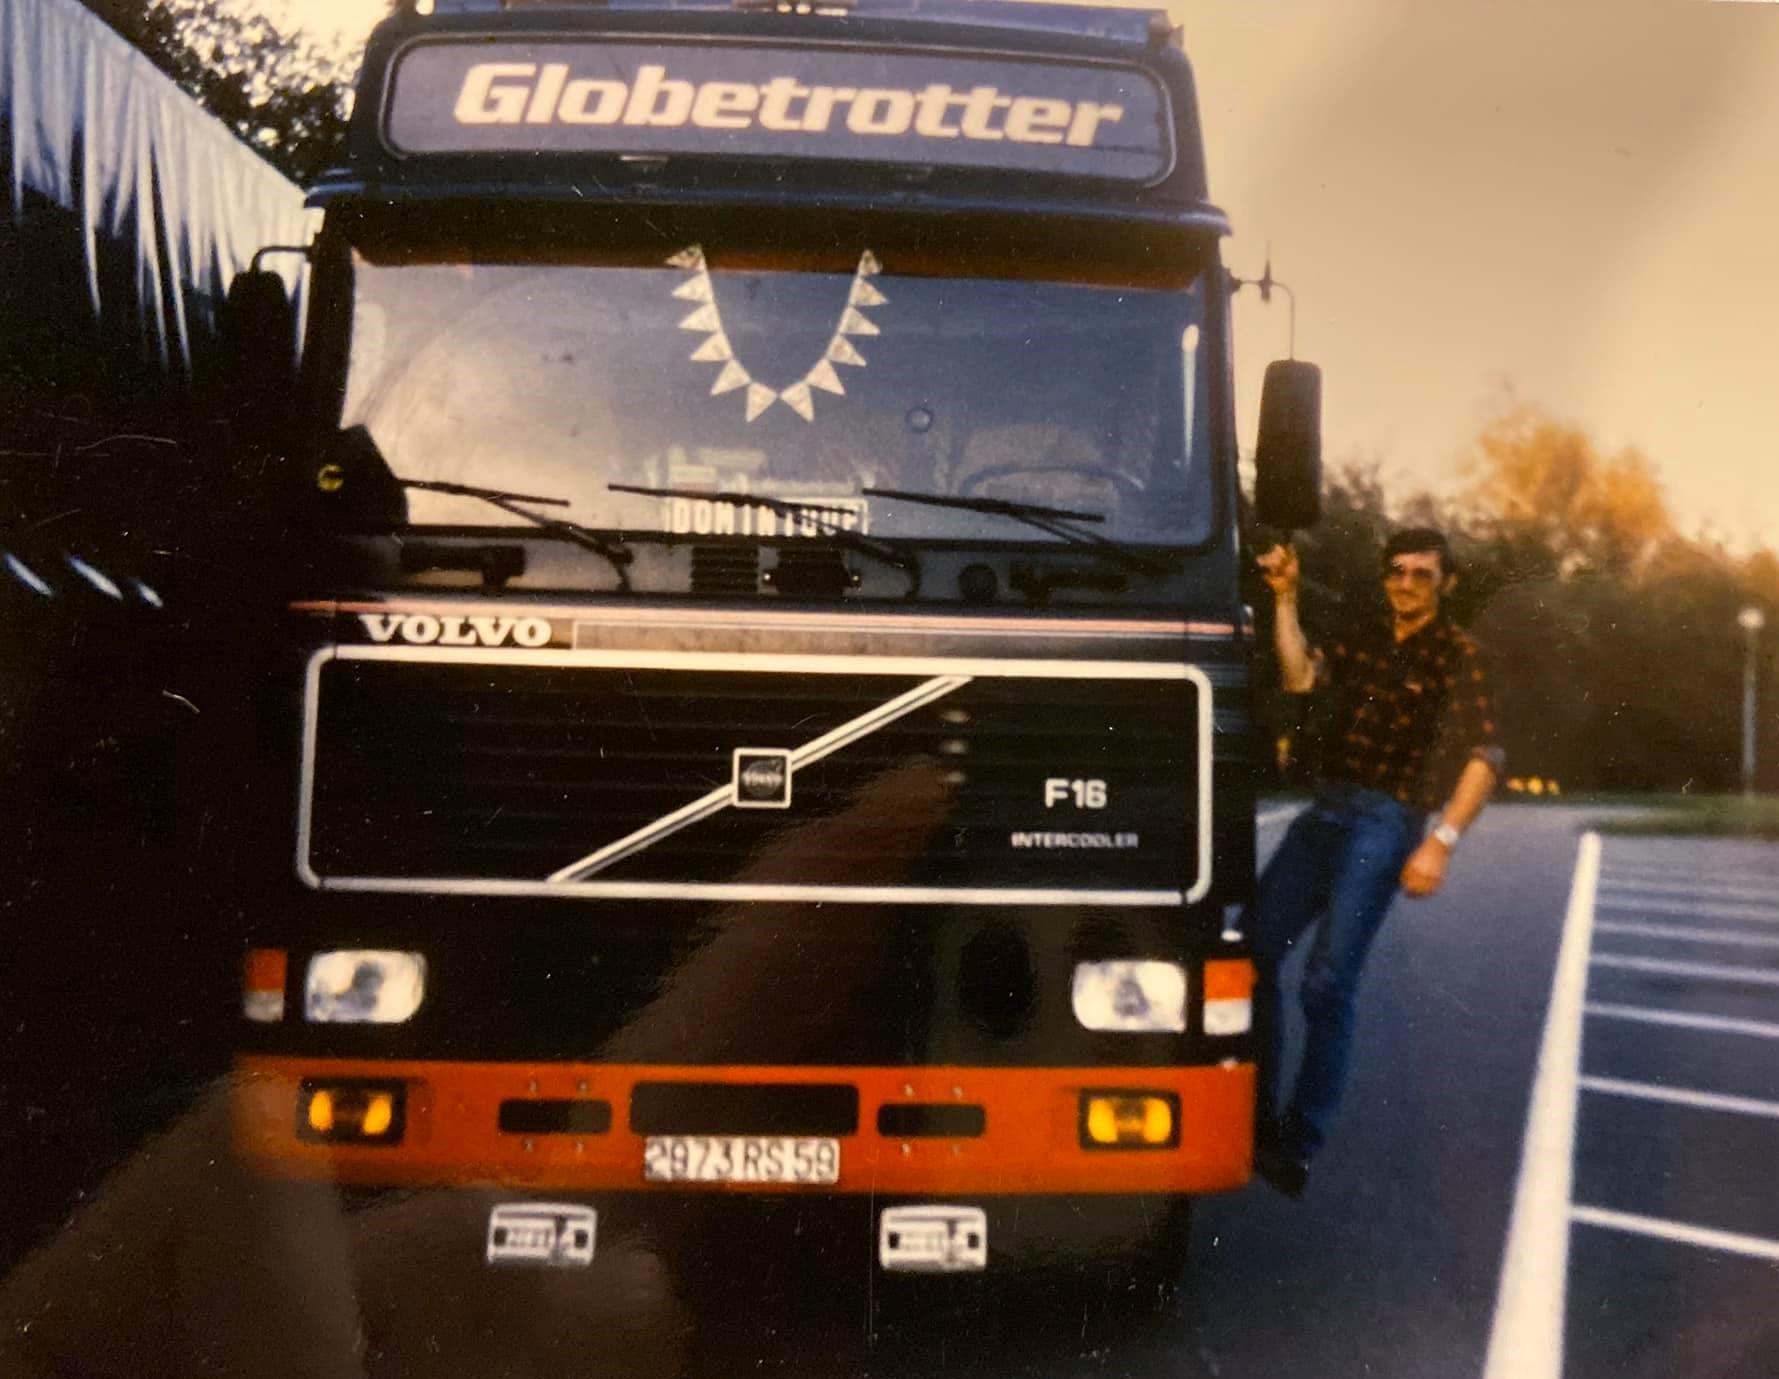 0-Volvo-F16